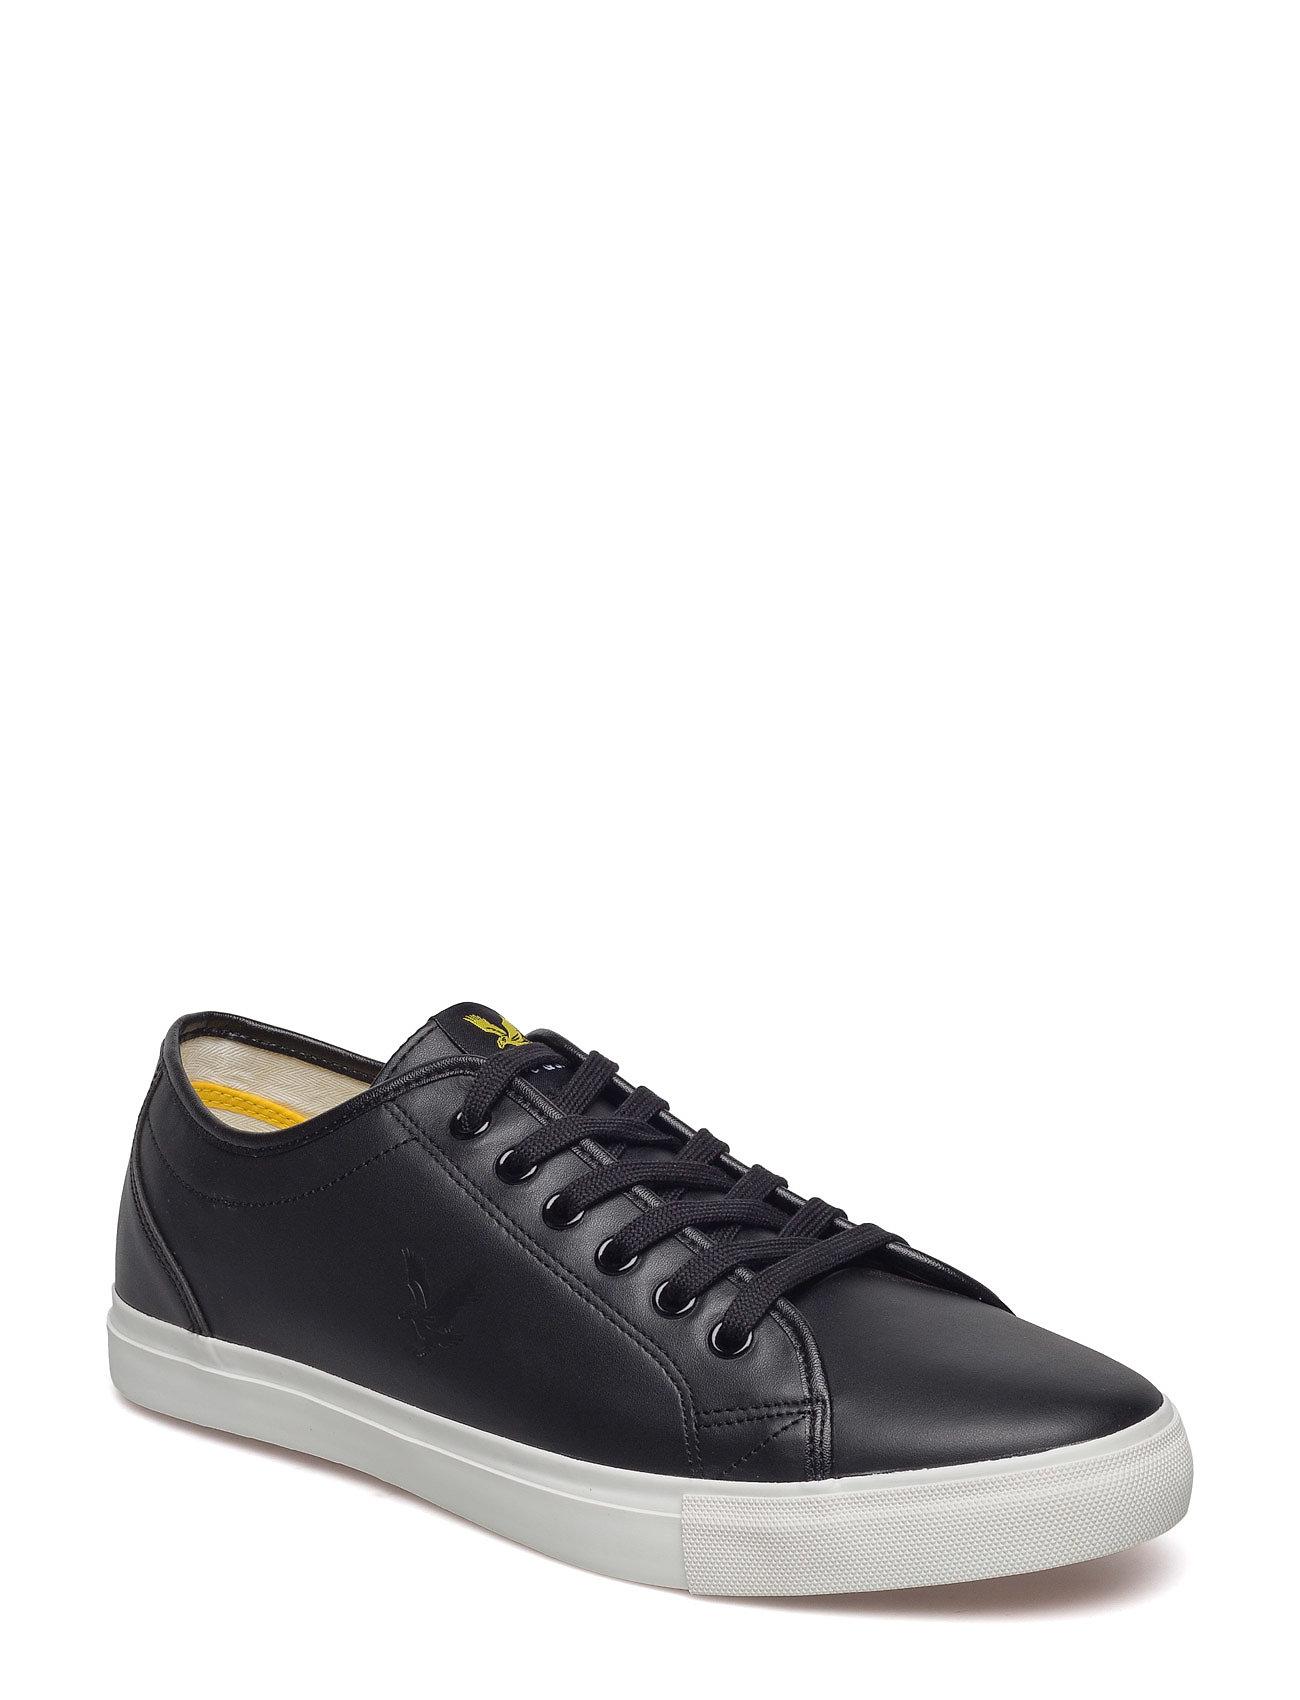 Teviot Leather Lyle & Scott Sneakers til Herrer i